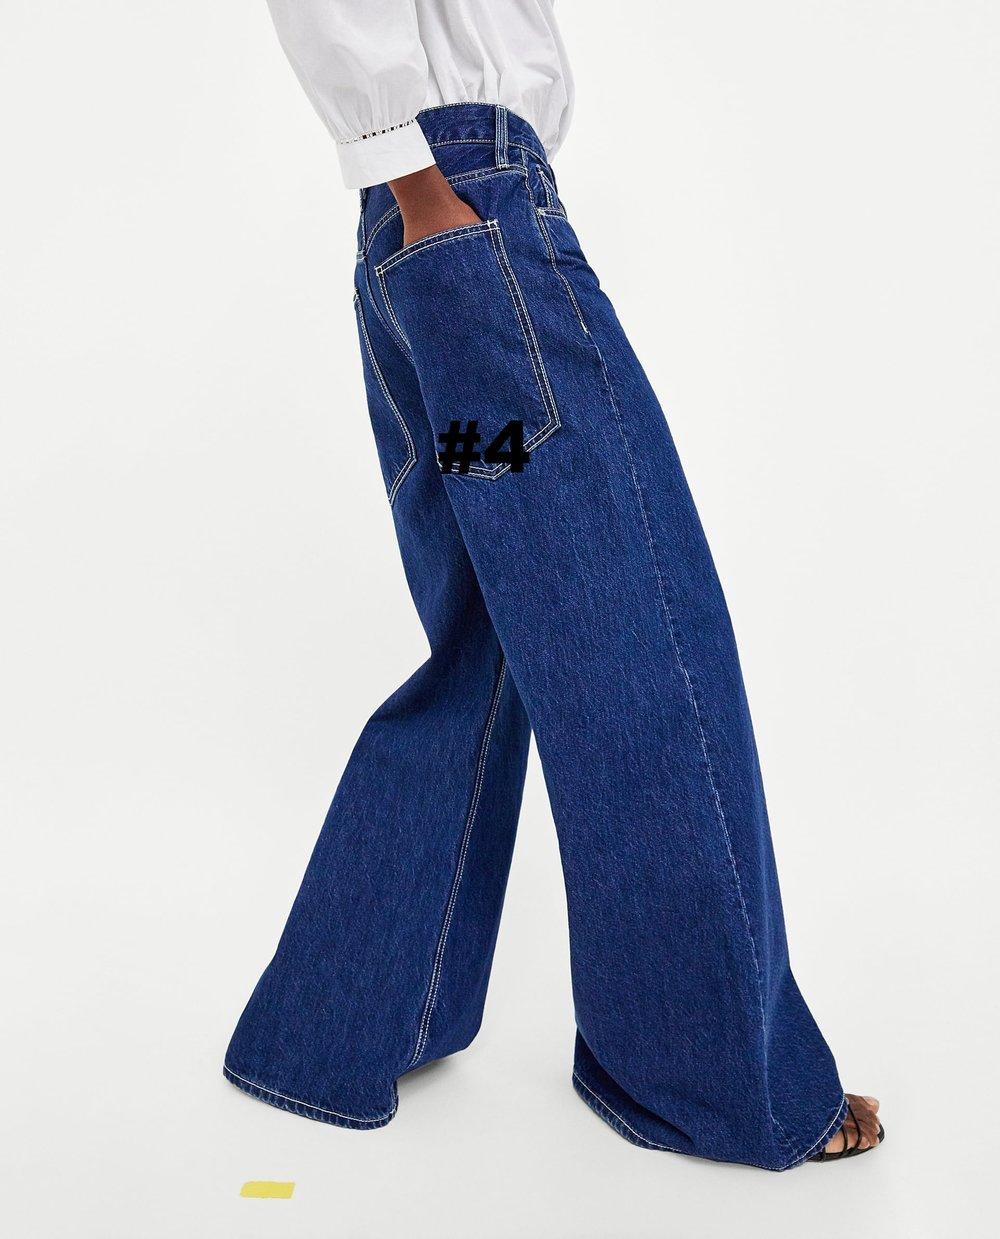 https://www.zara.com/ca/en/jeans-wide-leg-contrast-stitching-p06840054.html?v1=5547019&v2=1047051